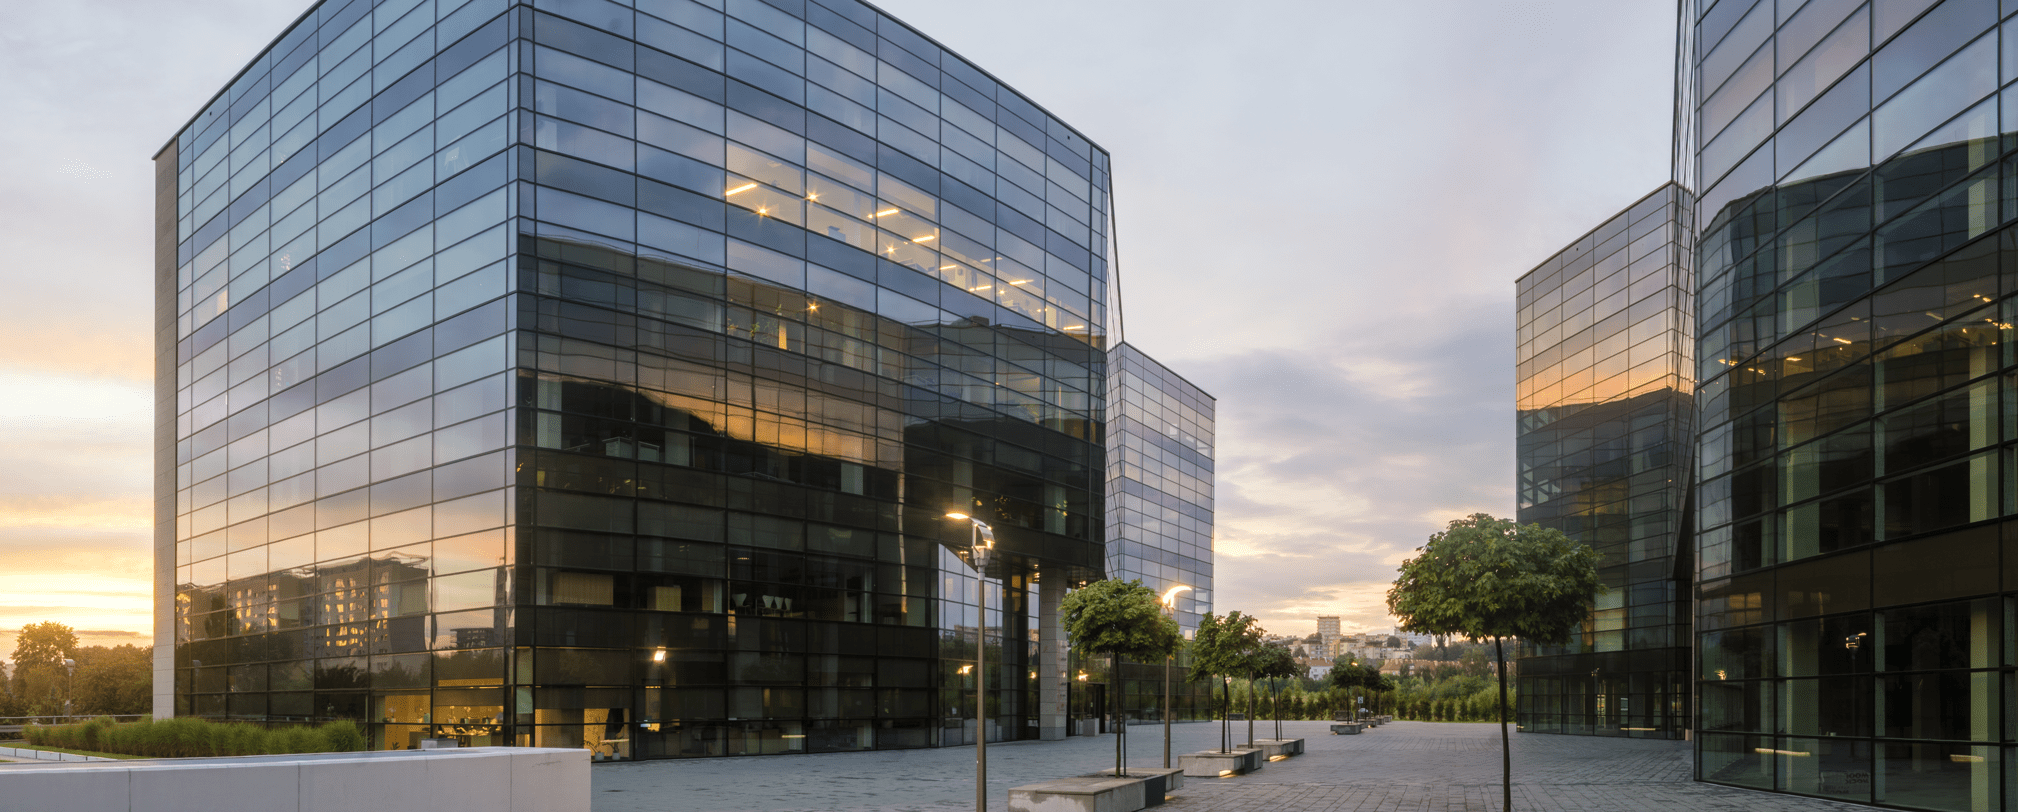 Performance Audit, Management Assessment | RCLCO Real Estate